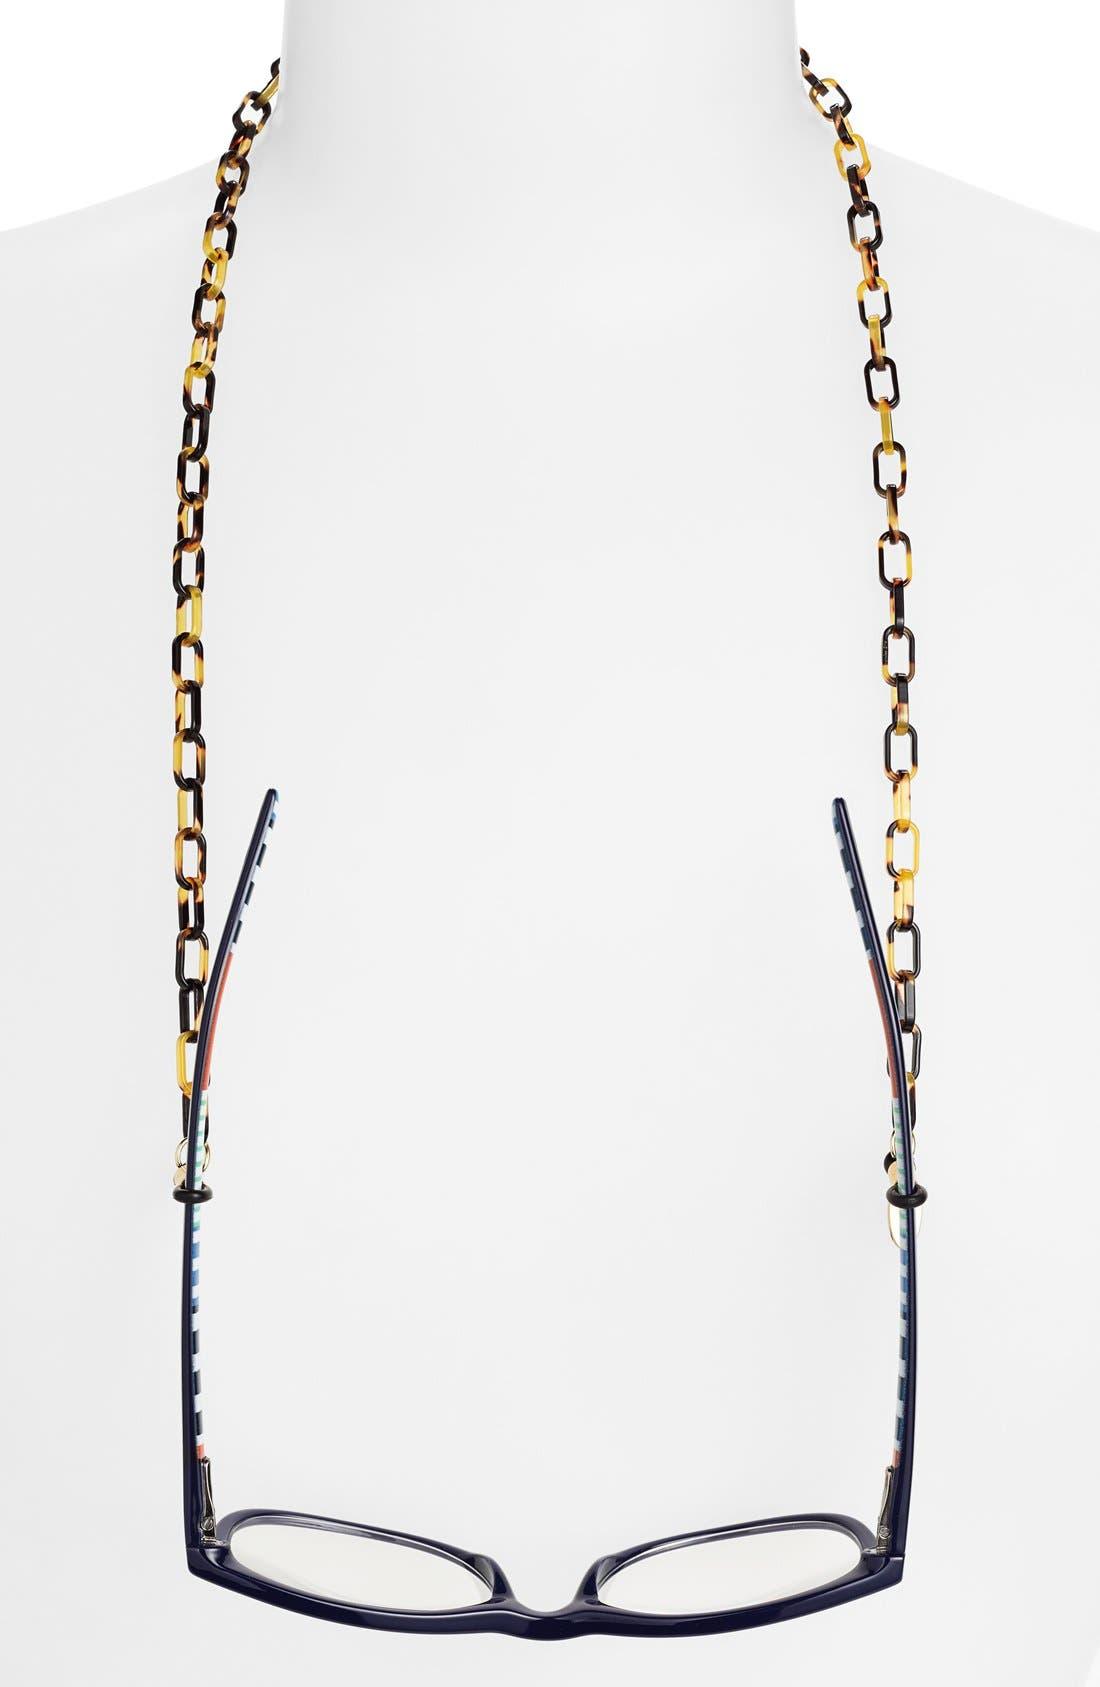 'Demi' Mini Oval Link Eyewear Chain,                             Main thumbnail 1, color,                             Tokyo